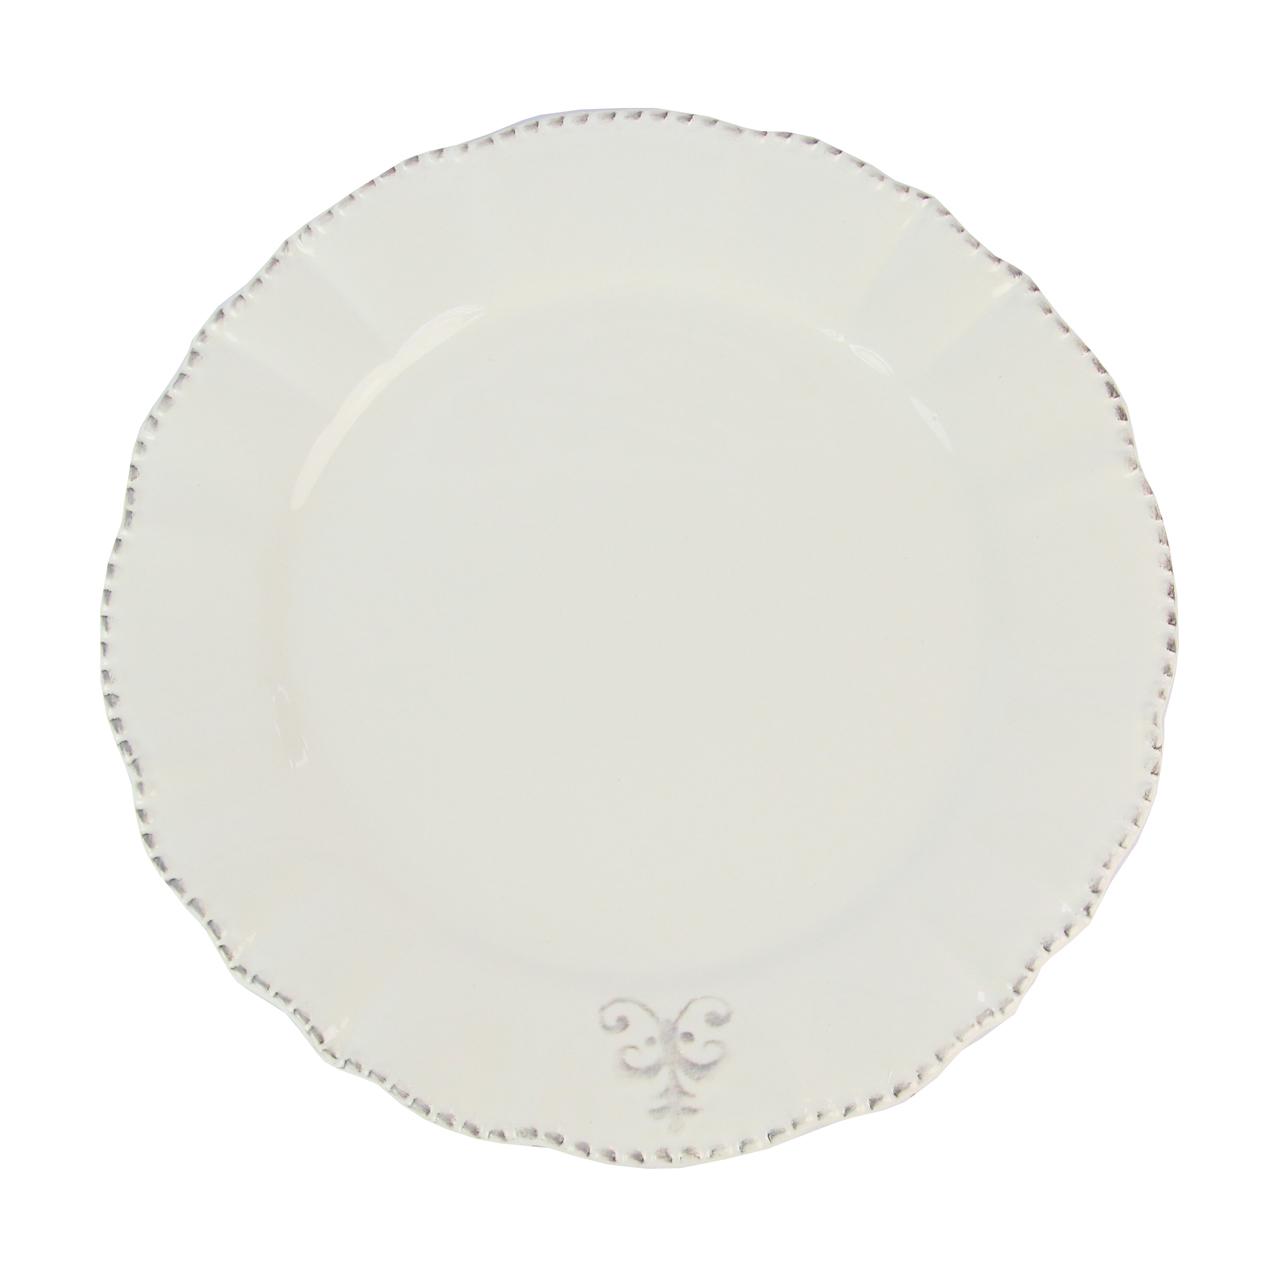 Farfurie Din Ceramica Alba 25.5 Cm